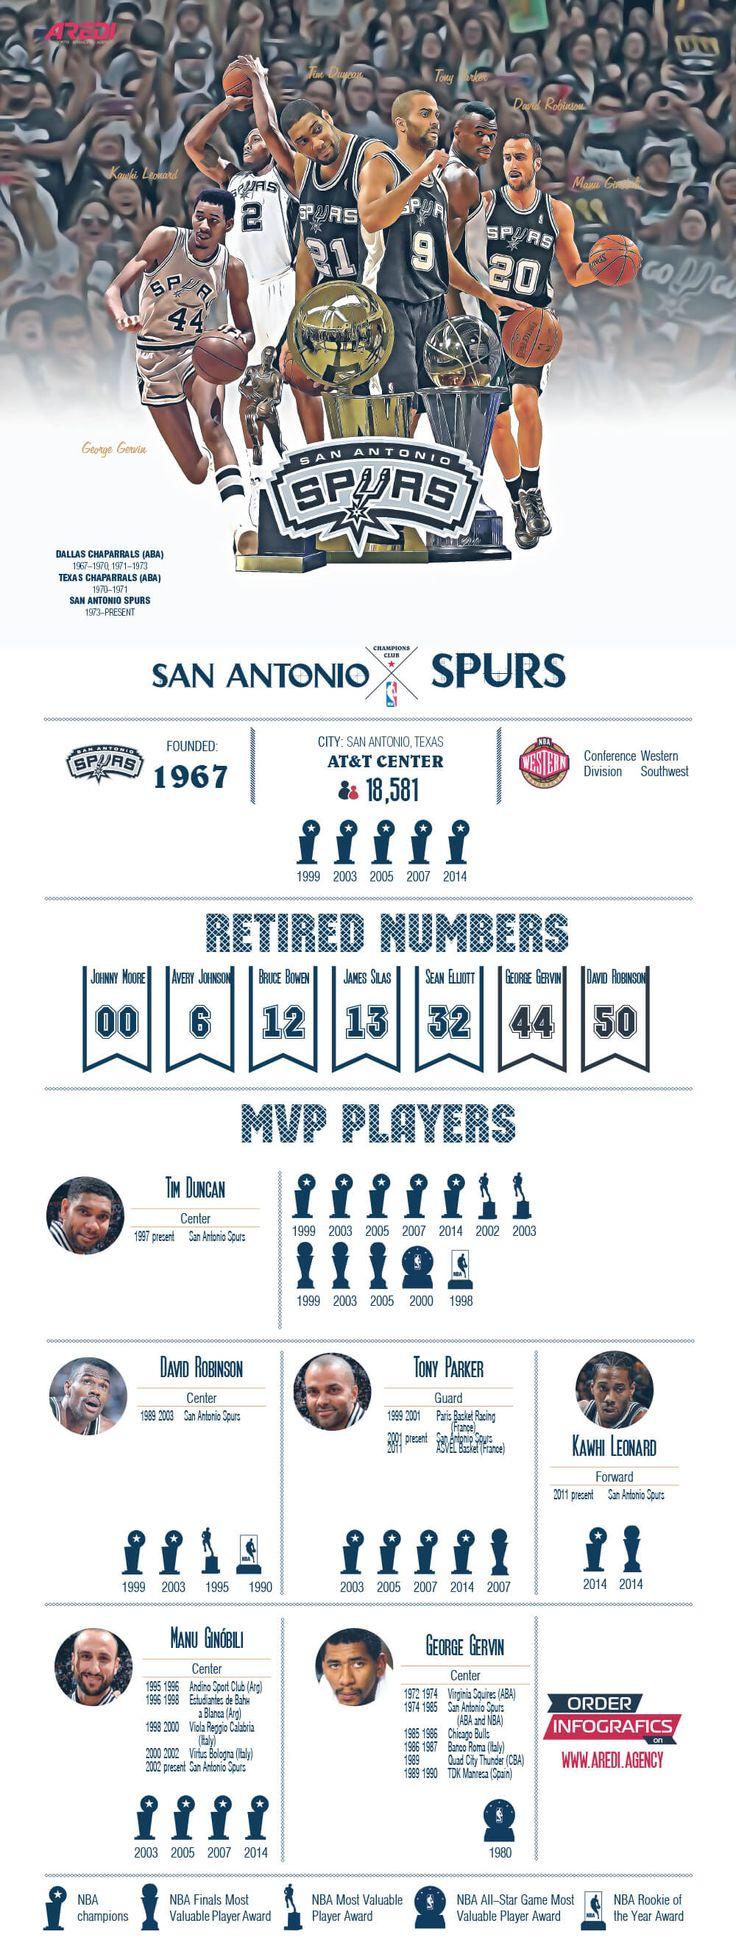 San Antonio Spurs, infographic, art, sport, create, design, basketball, club, branding, NBA, MVP legends, histoty, All Star game, Tim Duncan, Tony Parker, Manu Ginóbili,  Kawhi Leonard, George Gervin, David Robinson, #sportaredi